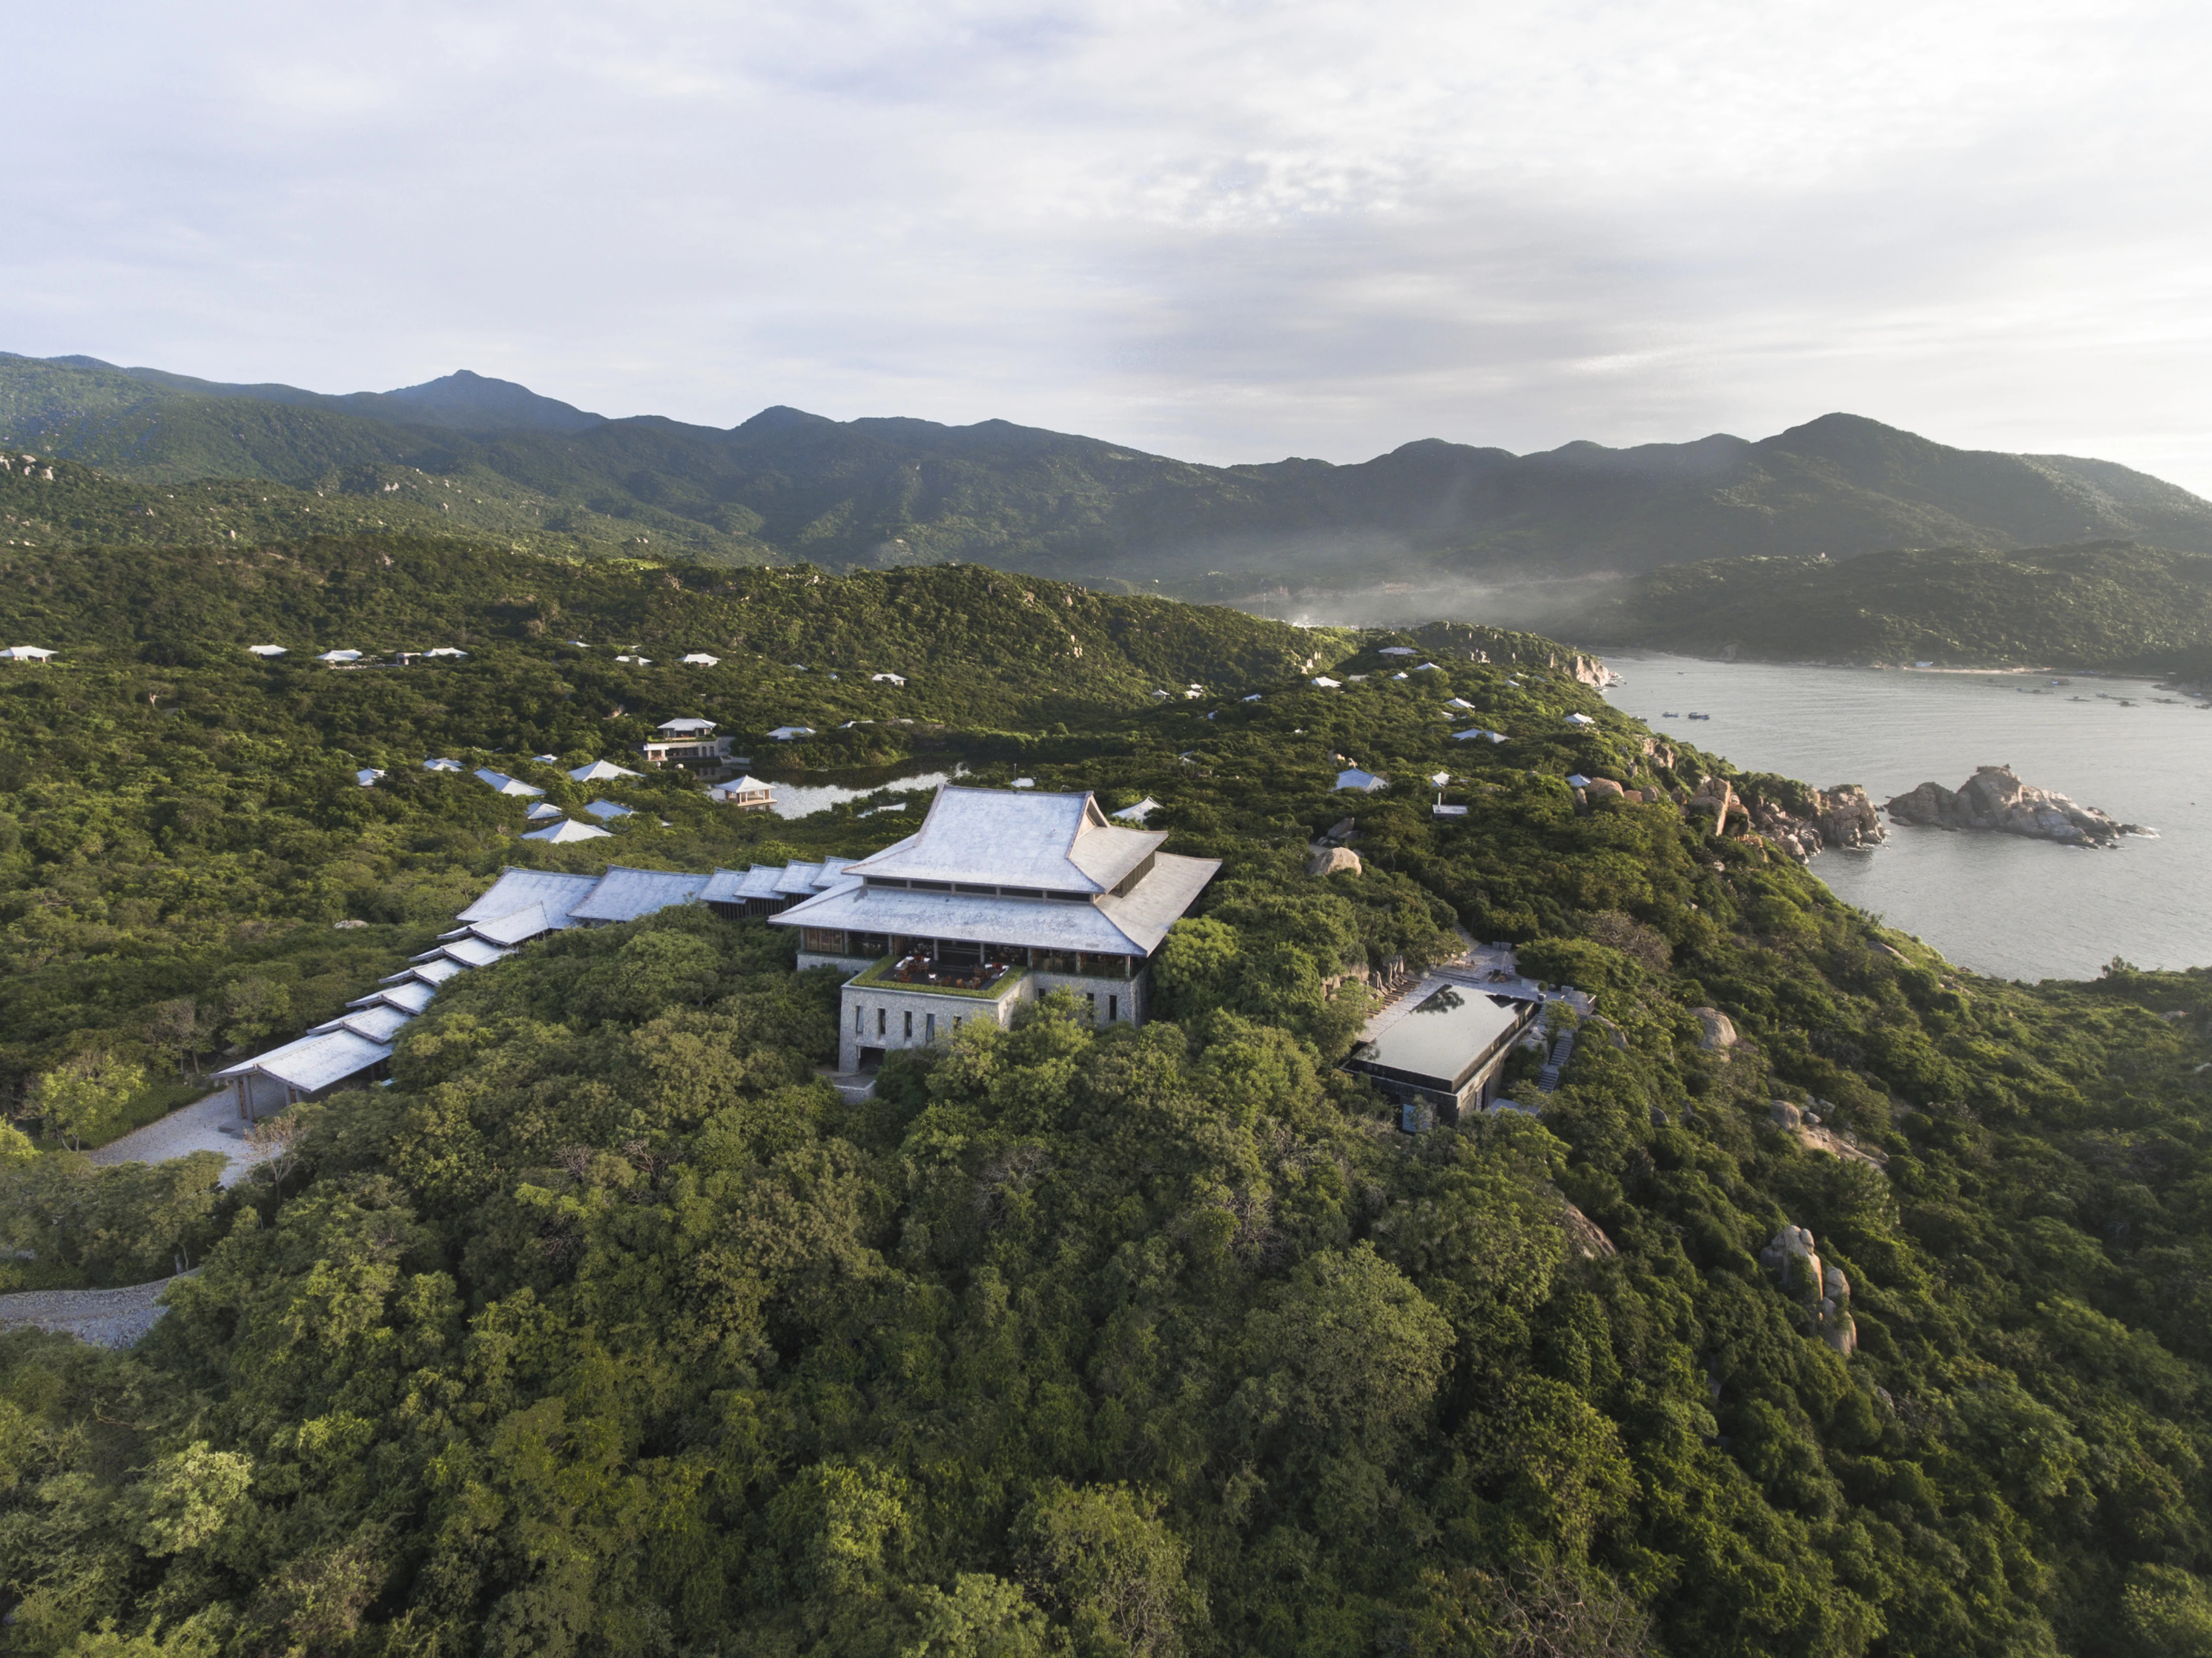 aerial view of central pavilio 6793 3316 1585197612 - 6 resort của Việt Nam lên báo Anh